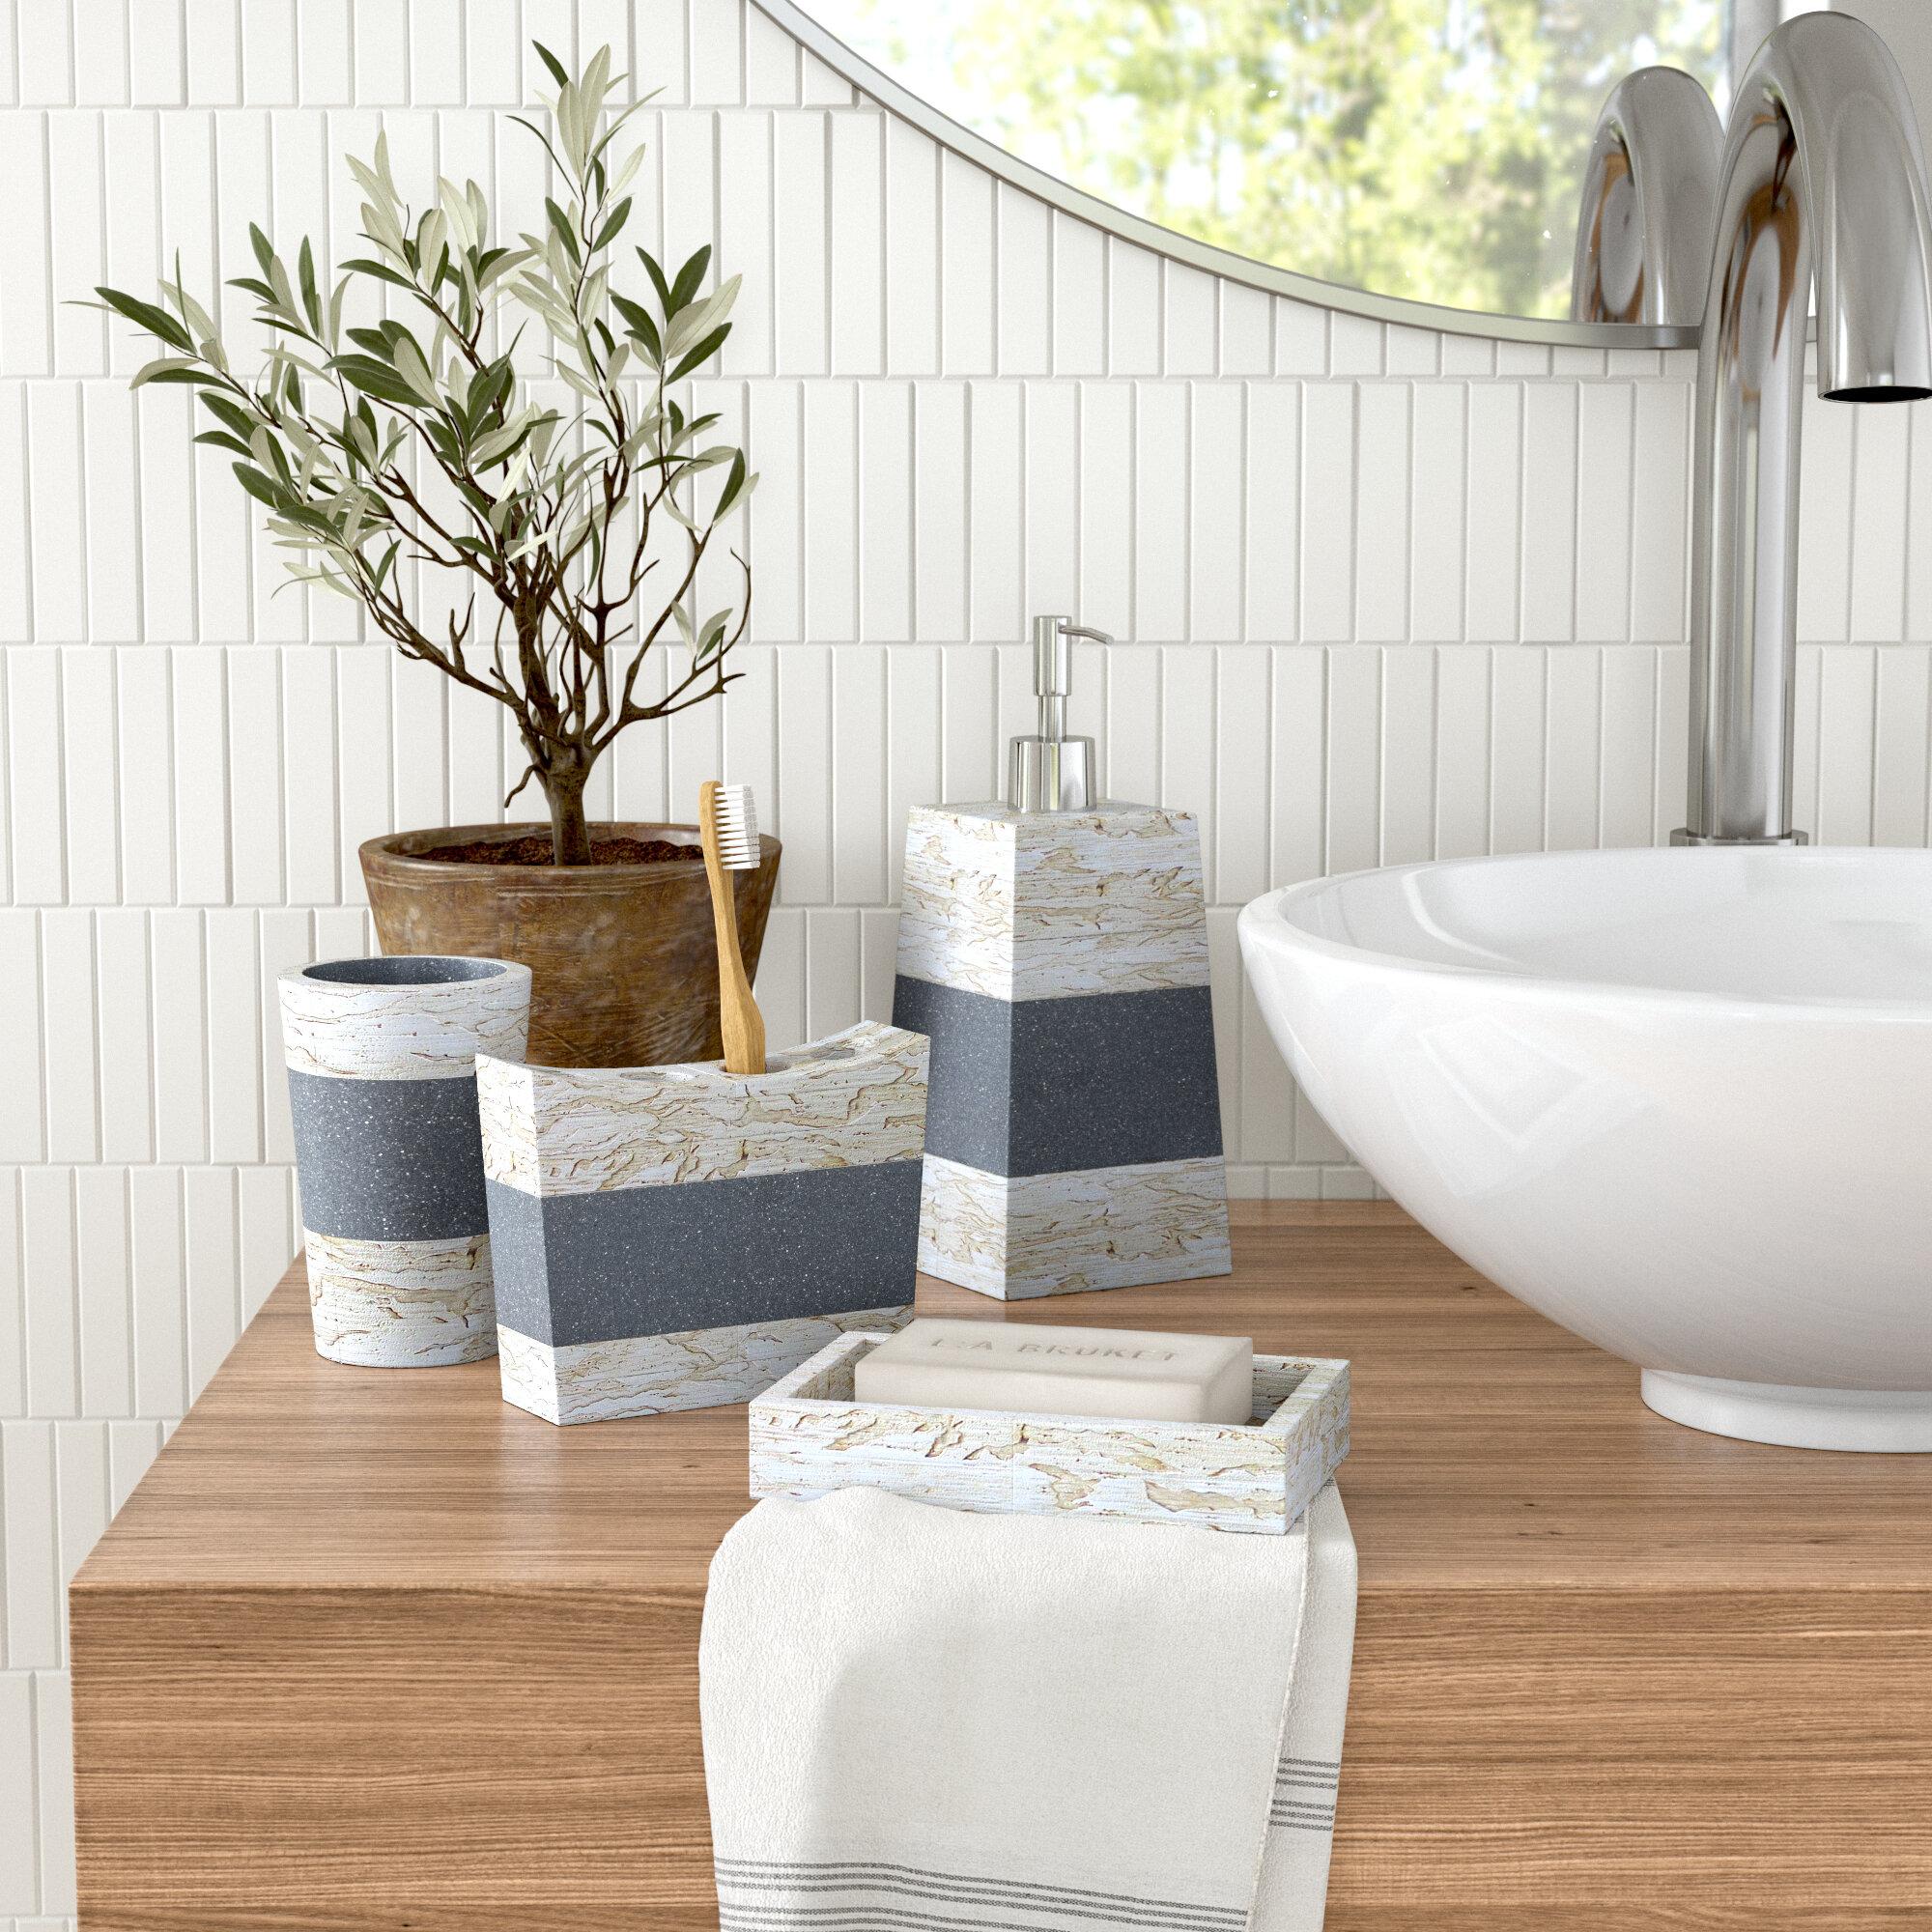 19 Piece Bathroom Combo 2 Tone Different Design Mix Match Bath Accessory Set Bathroom Accessory Sets Home Garden